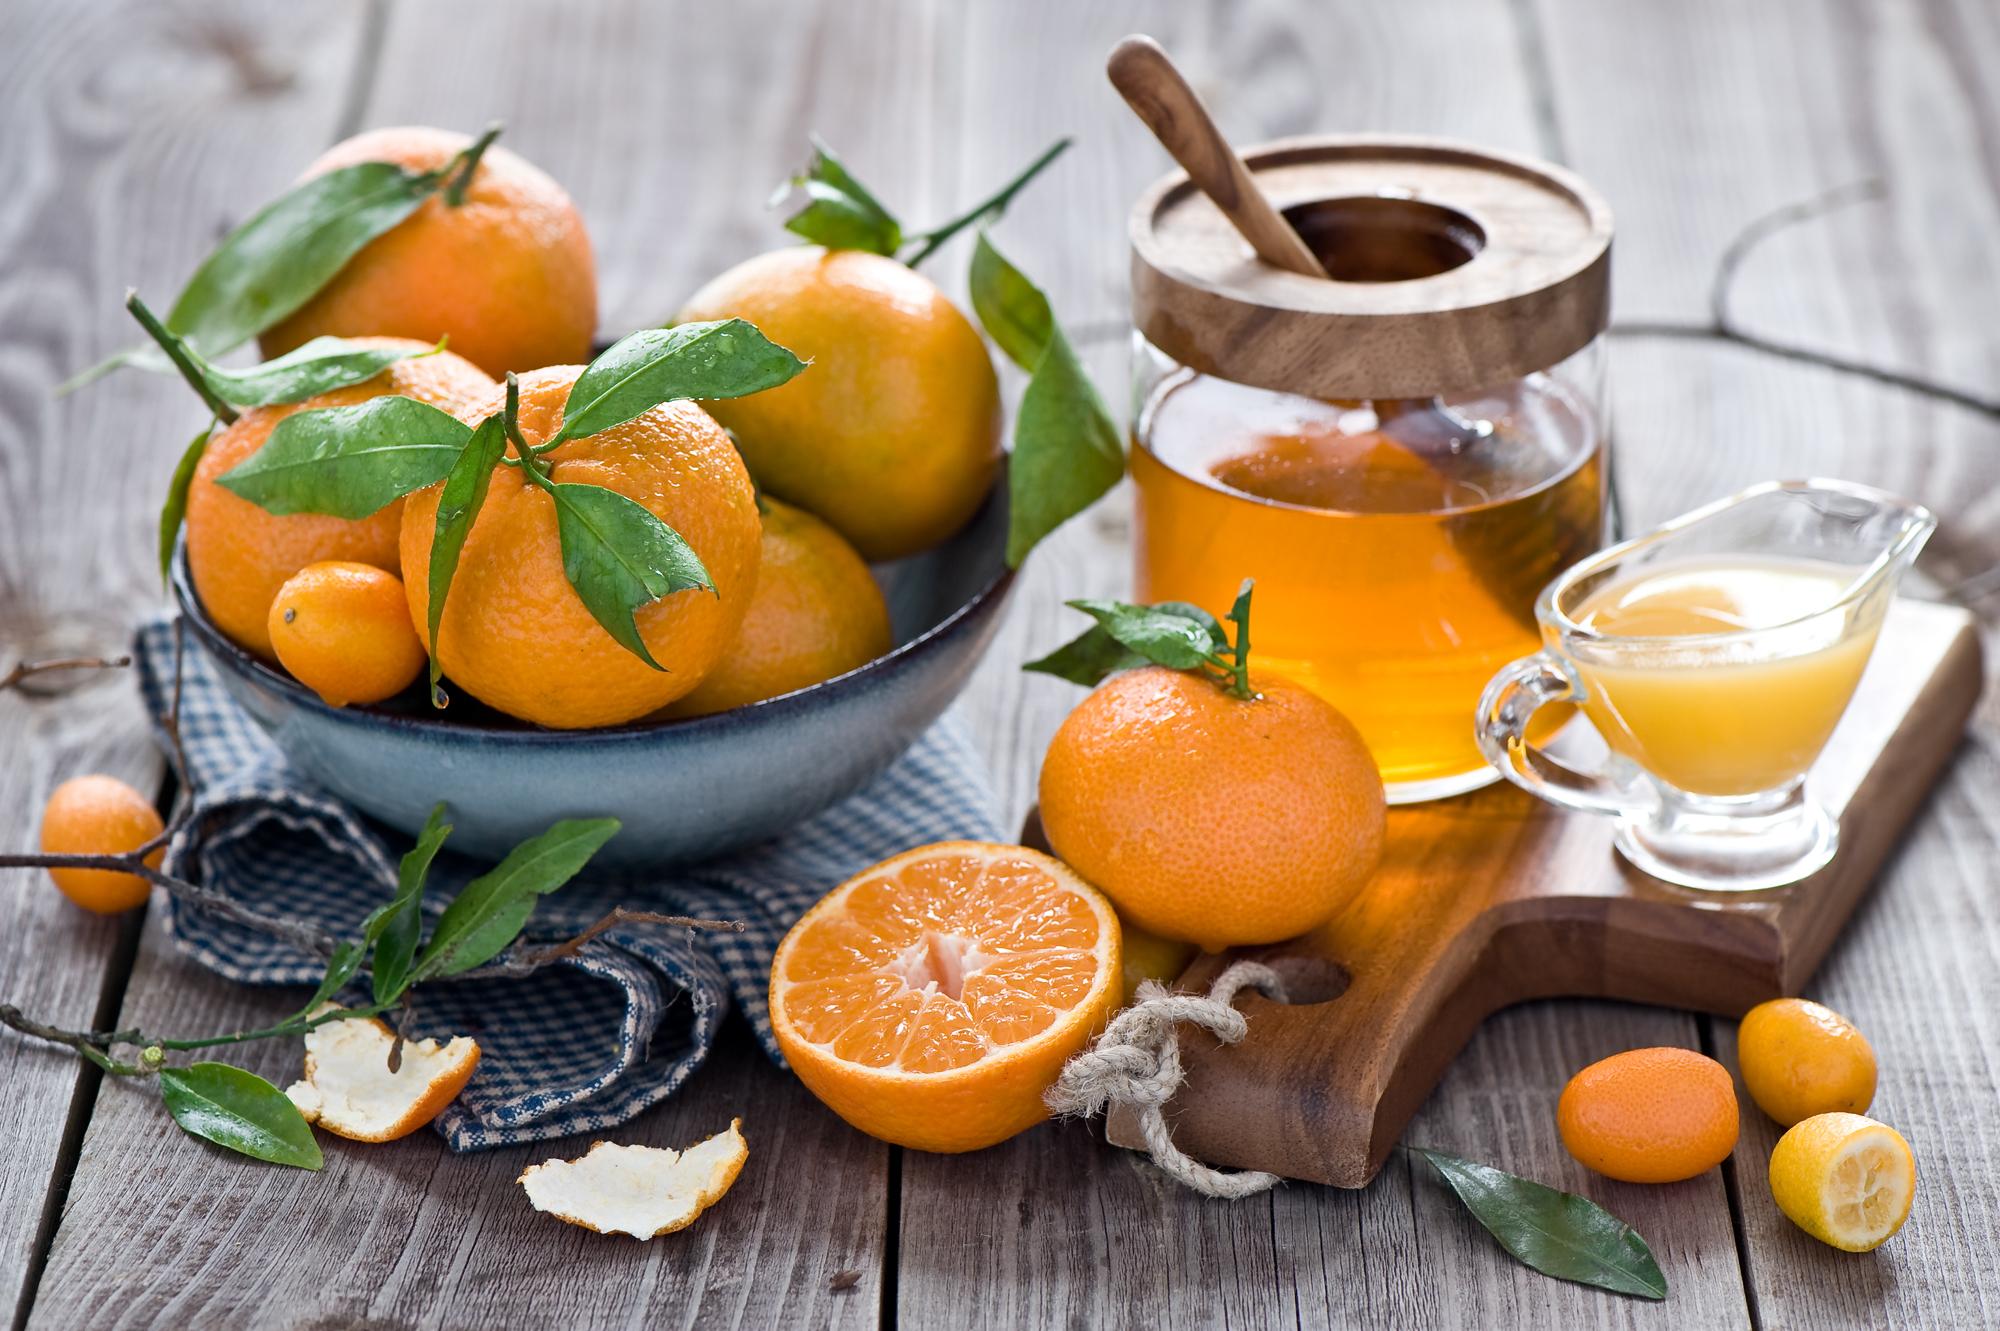 Awesome Orange Juice Wallpaper Wallpaper WallpaperLepi 2000x1331